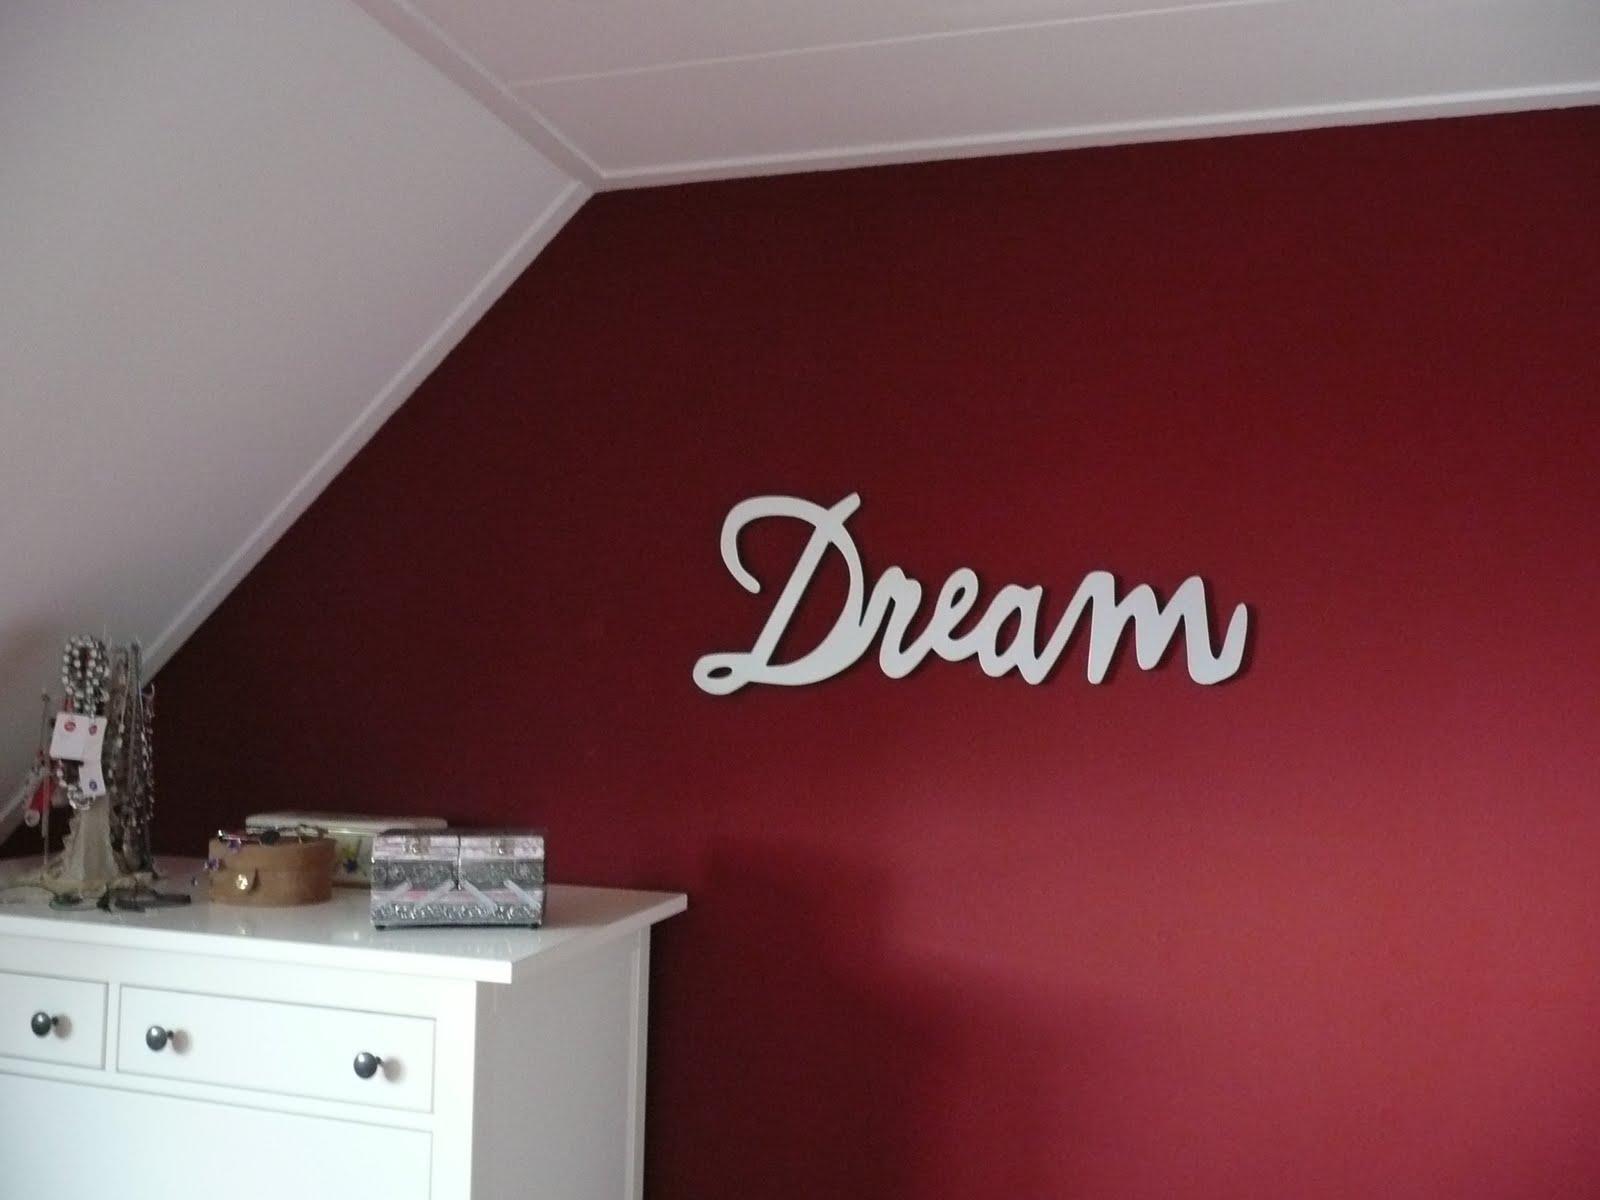 Bordeaux Rode Slaapkamer : Rode slaapkamer muur u2013 artsmedia.info